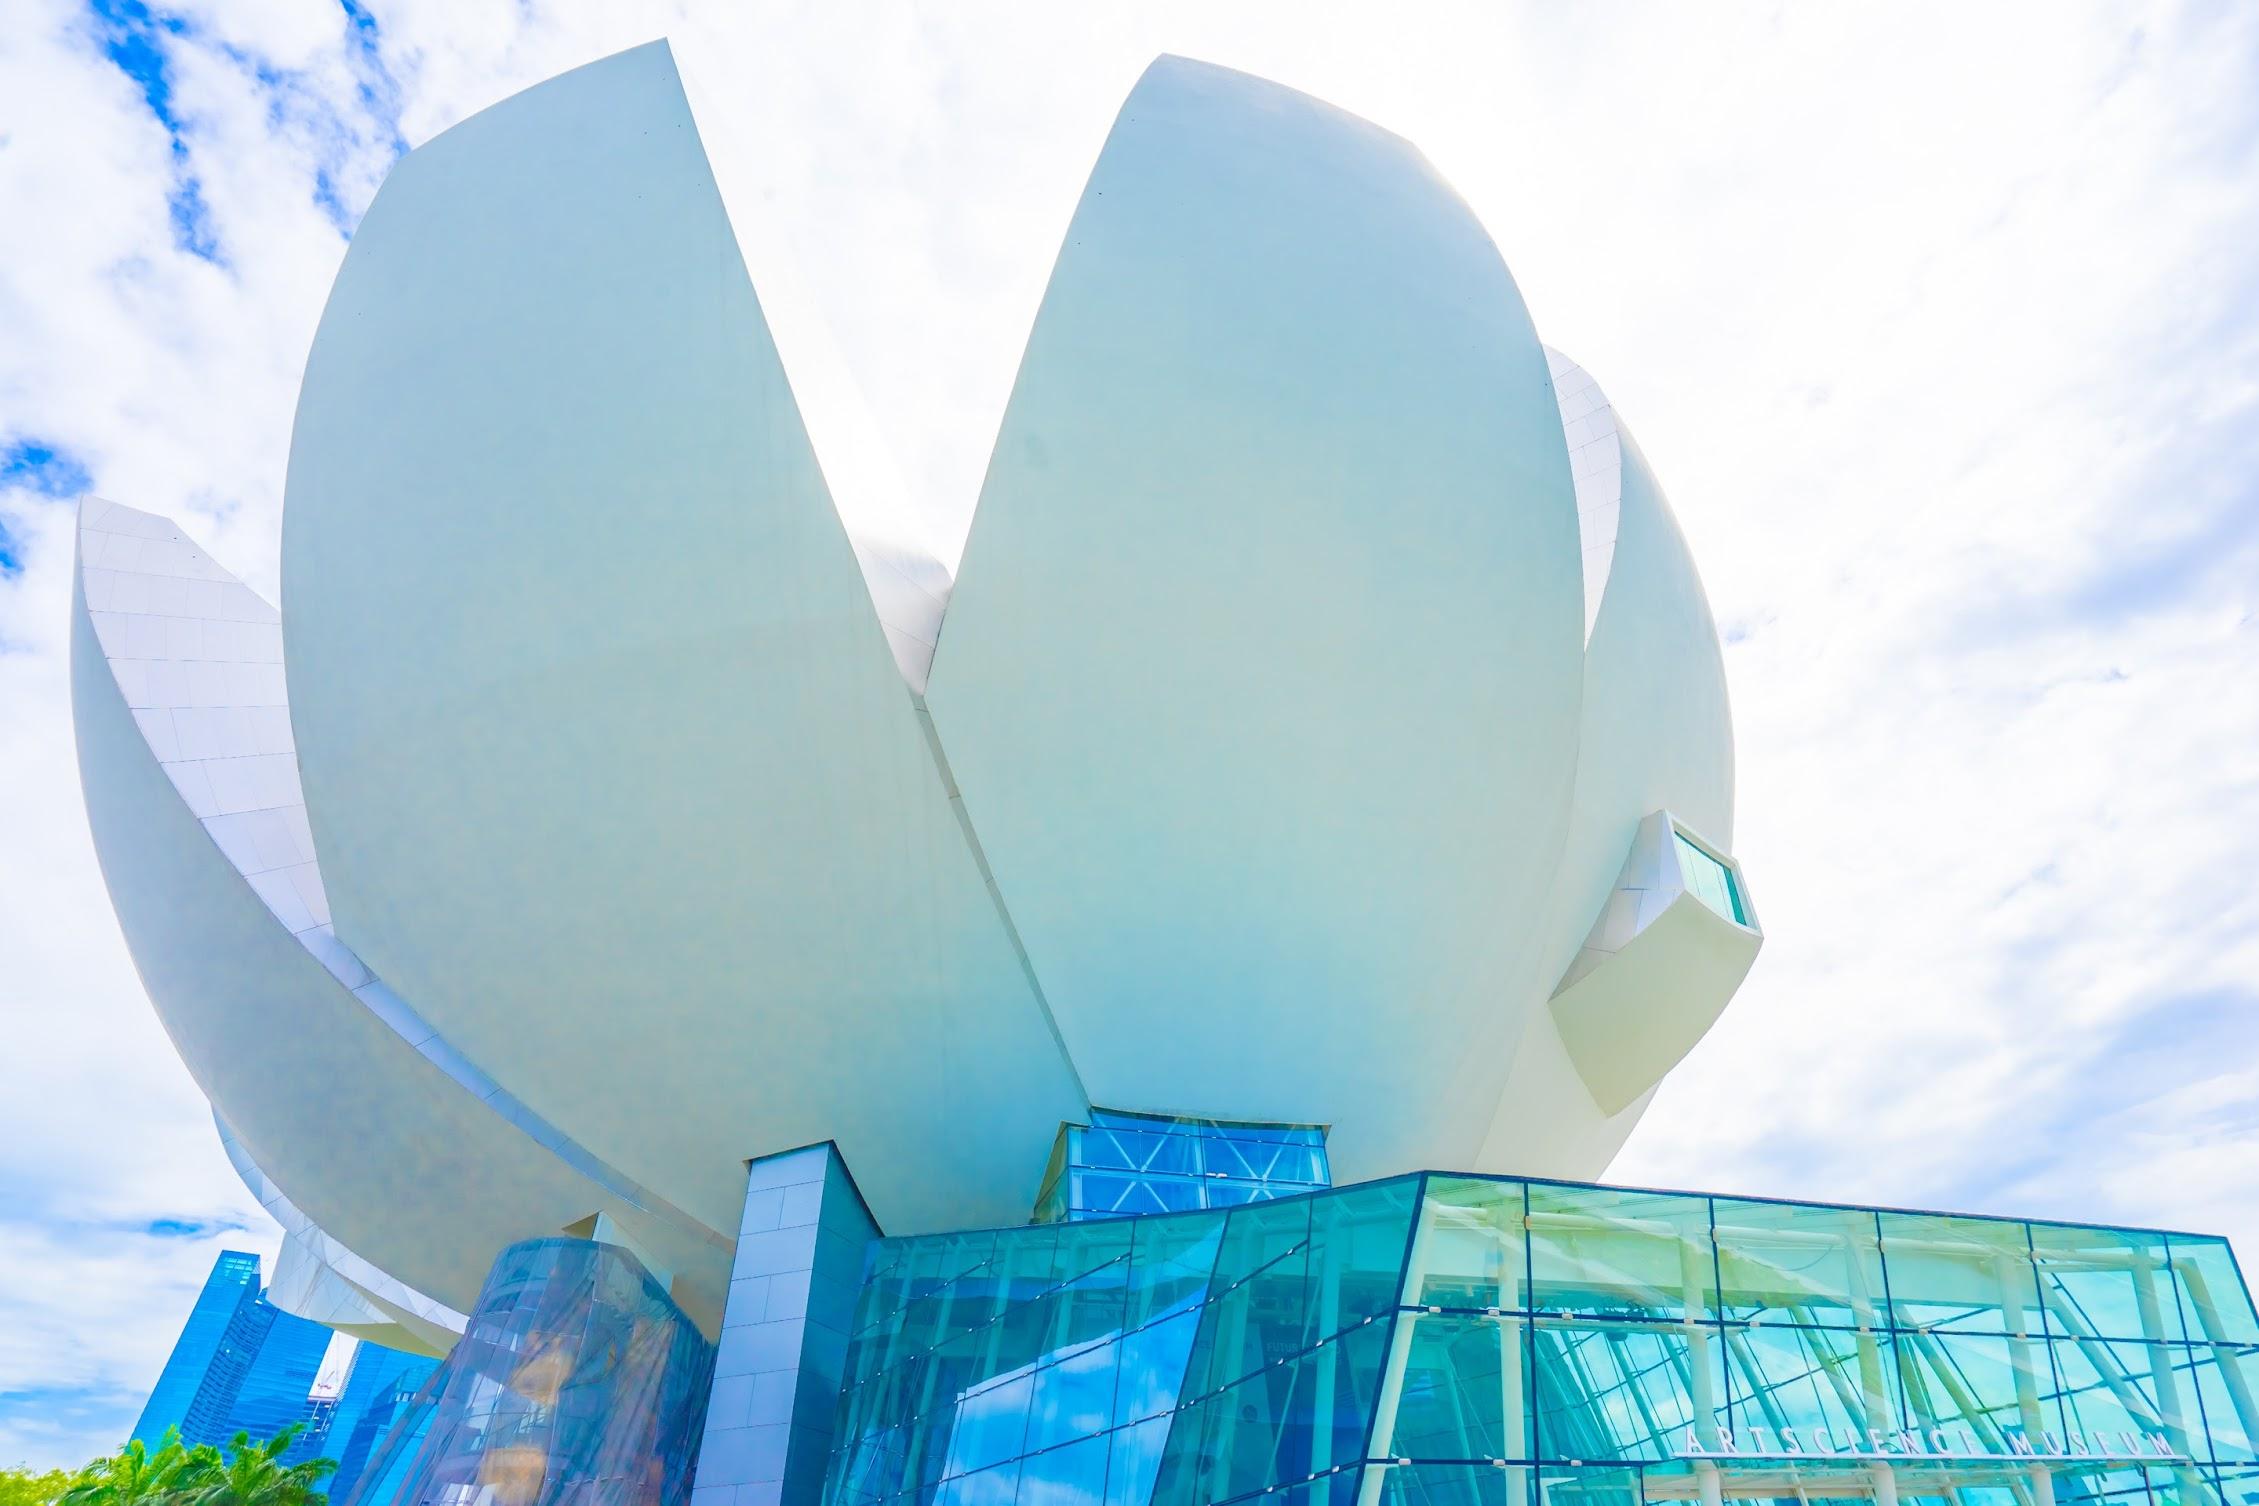 Singapore ArtScience Museum